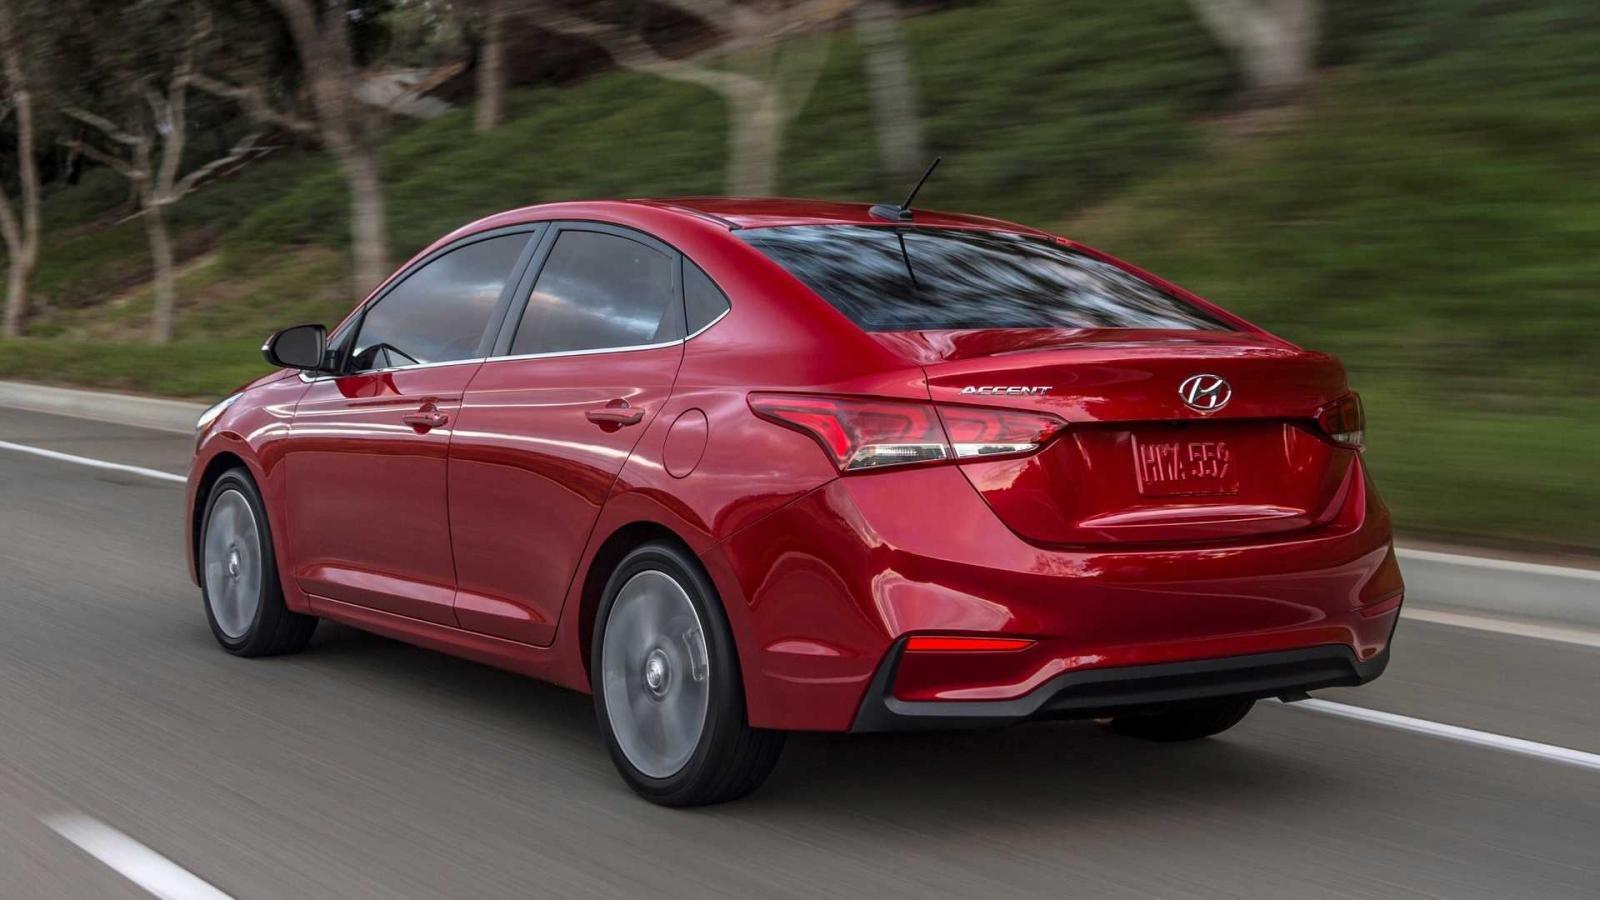 Giá xe Hyundai Accent 2020